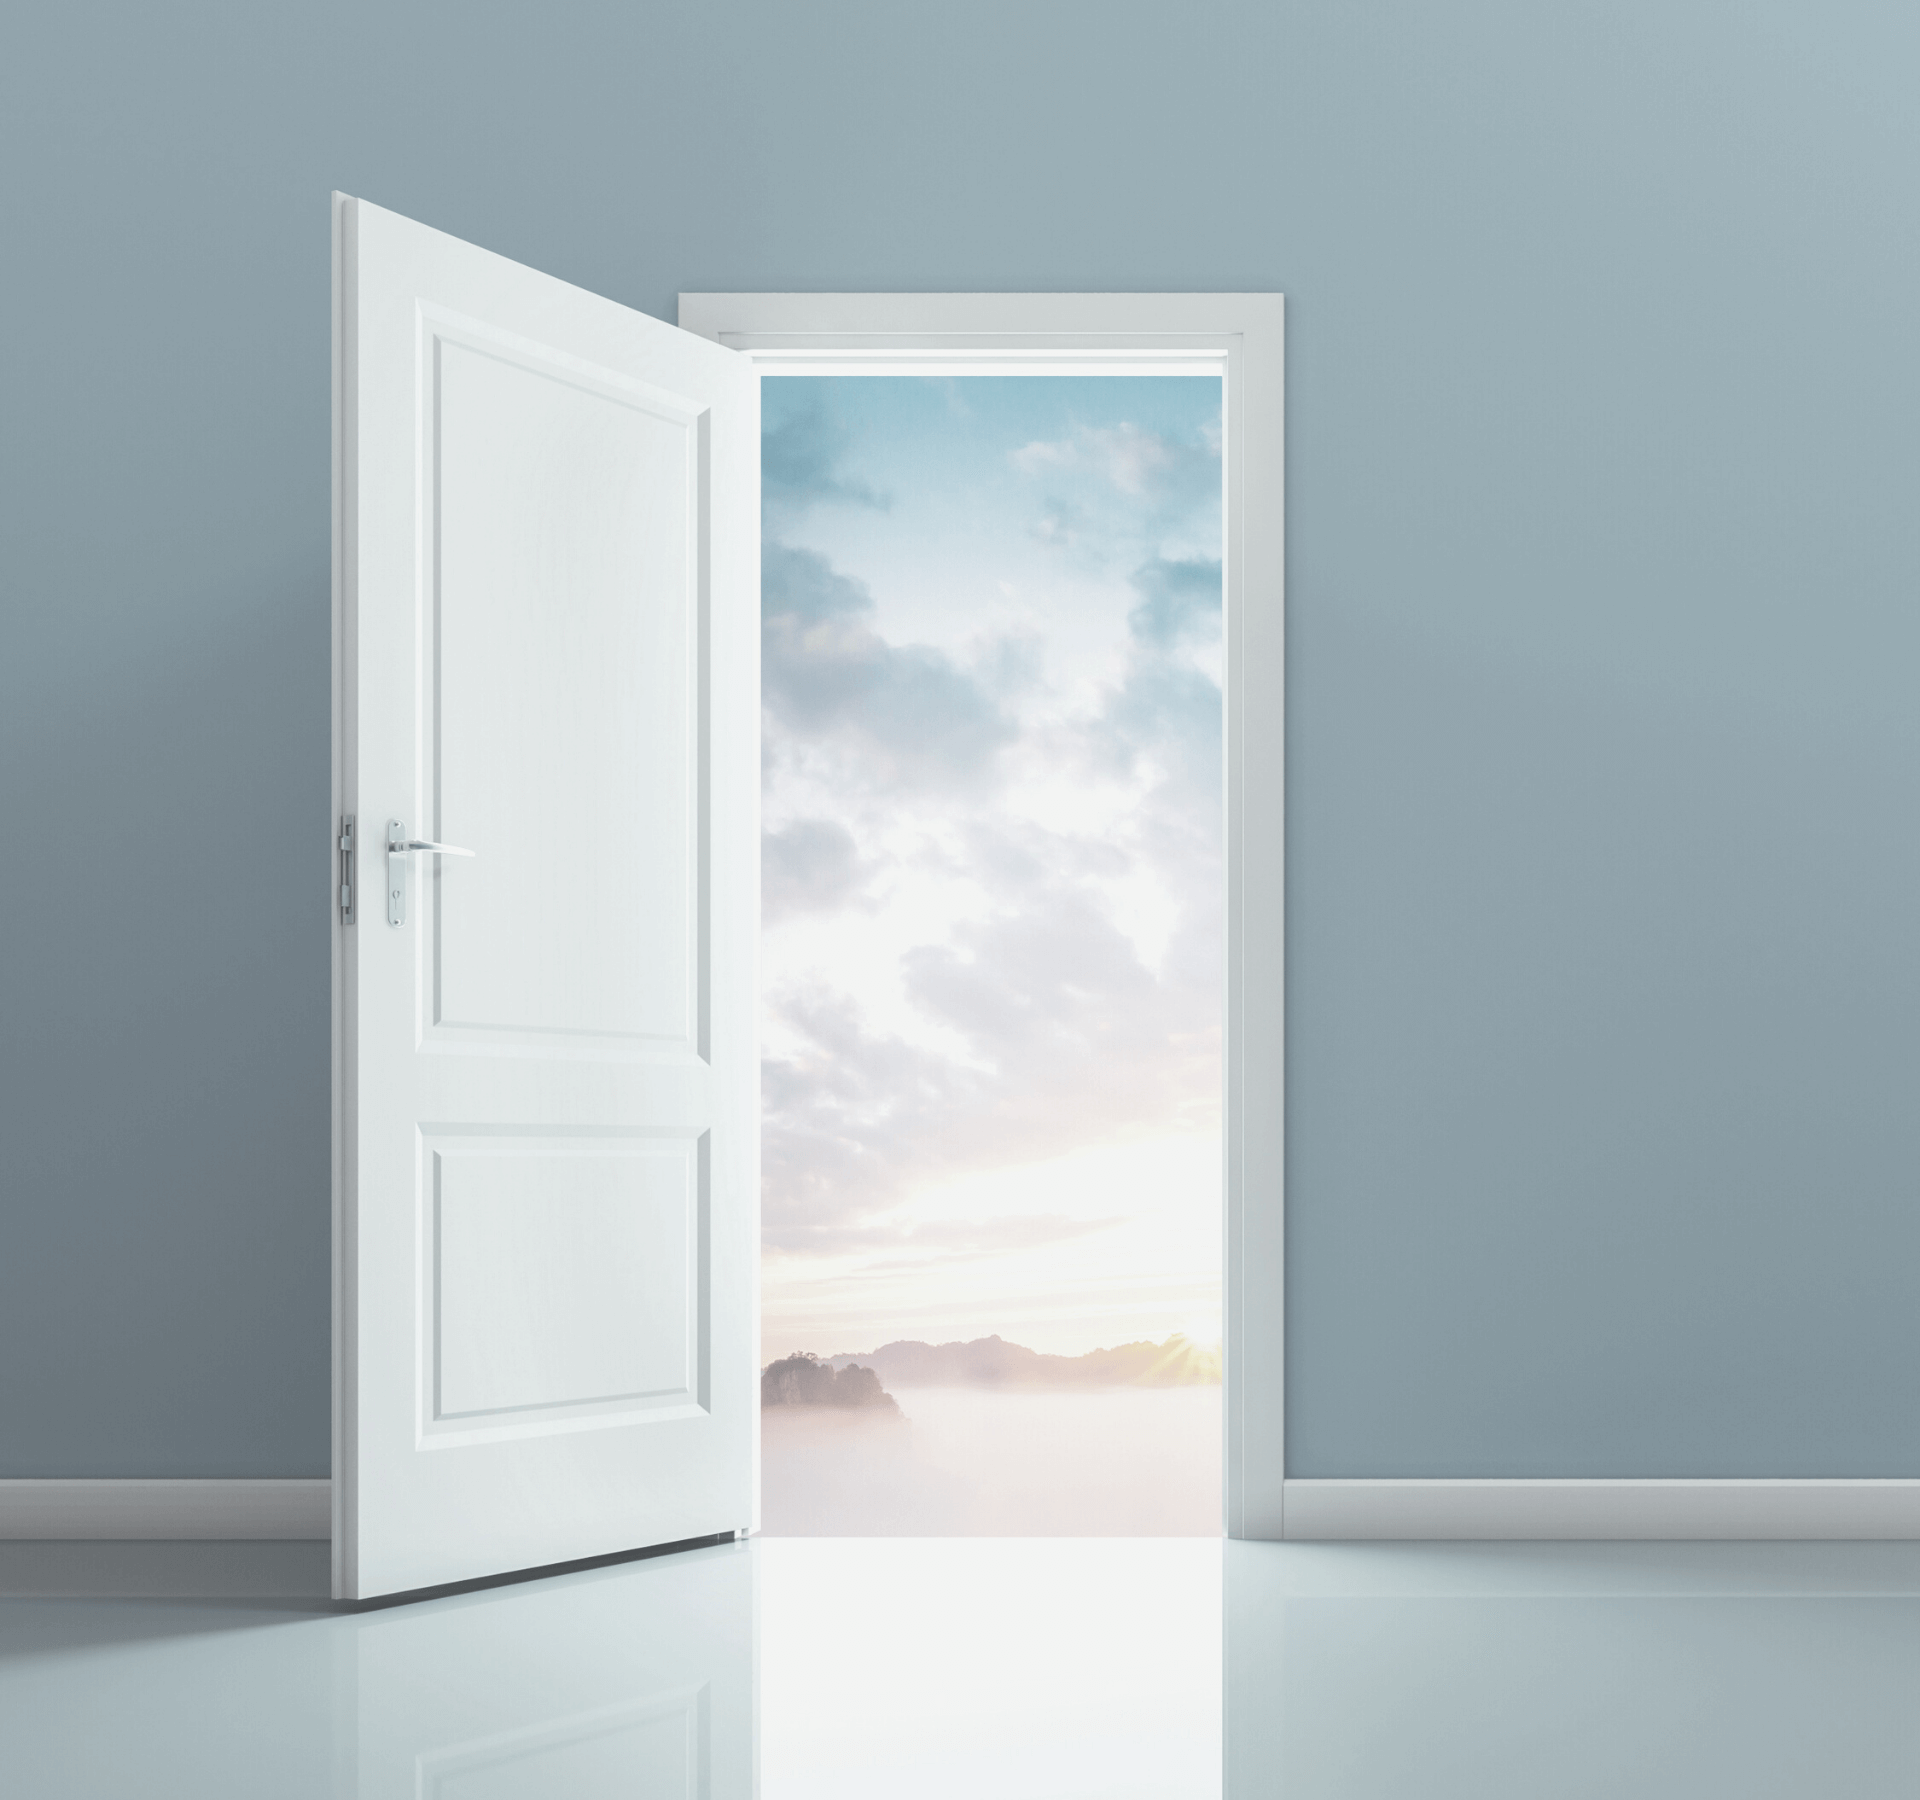 9 Business Branding Opportunities to Consider in 2020